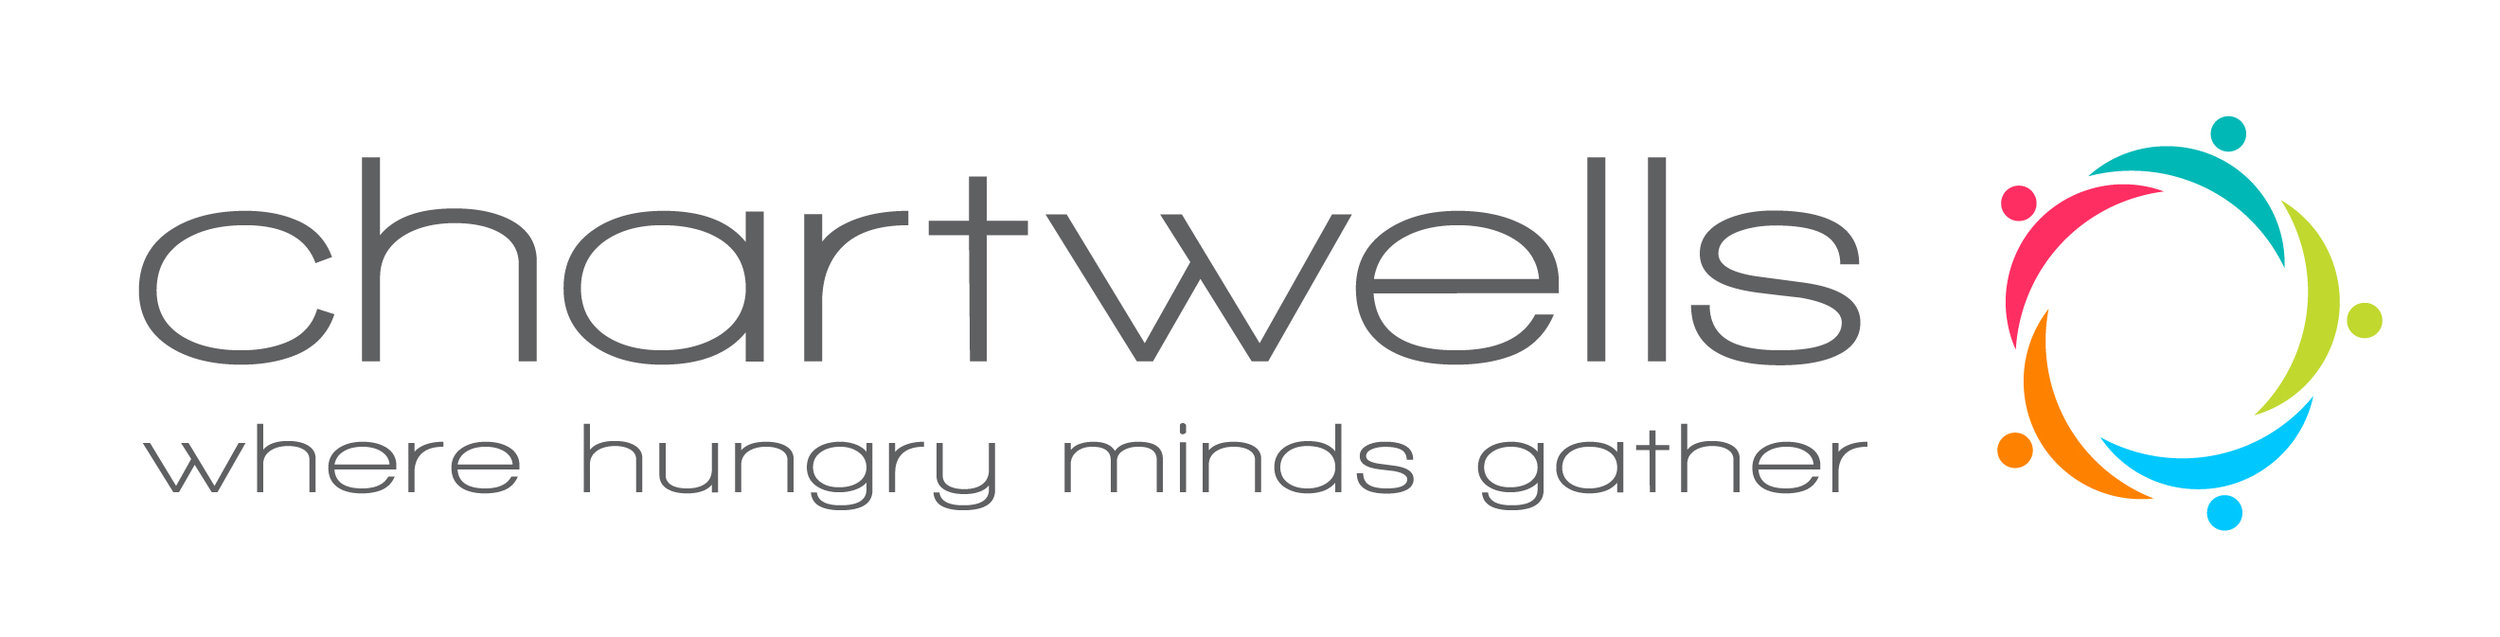 Chartwells Logo New and Resized.jpg